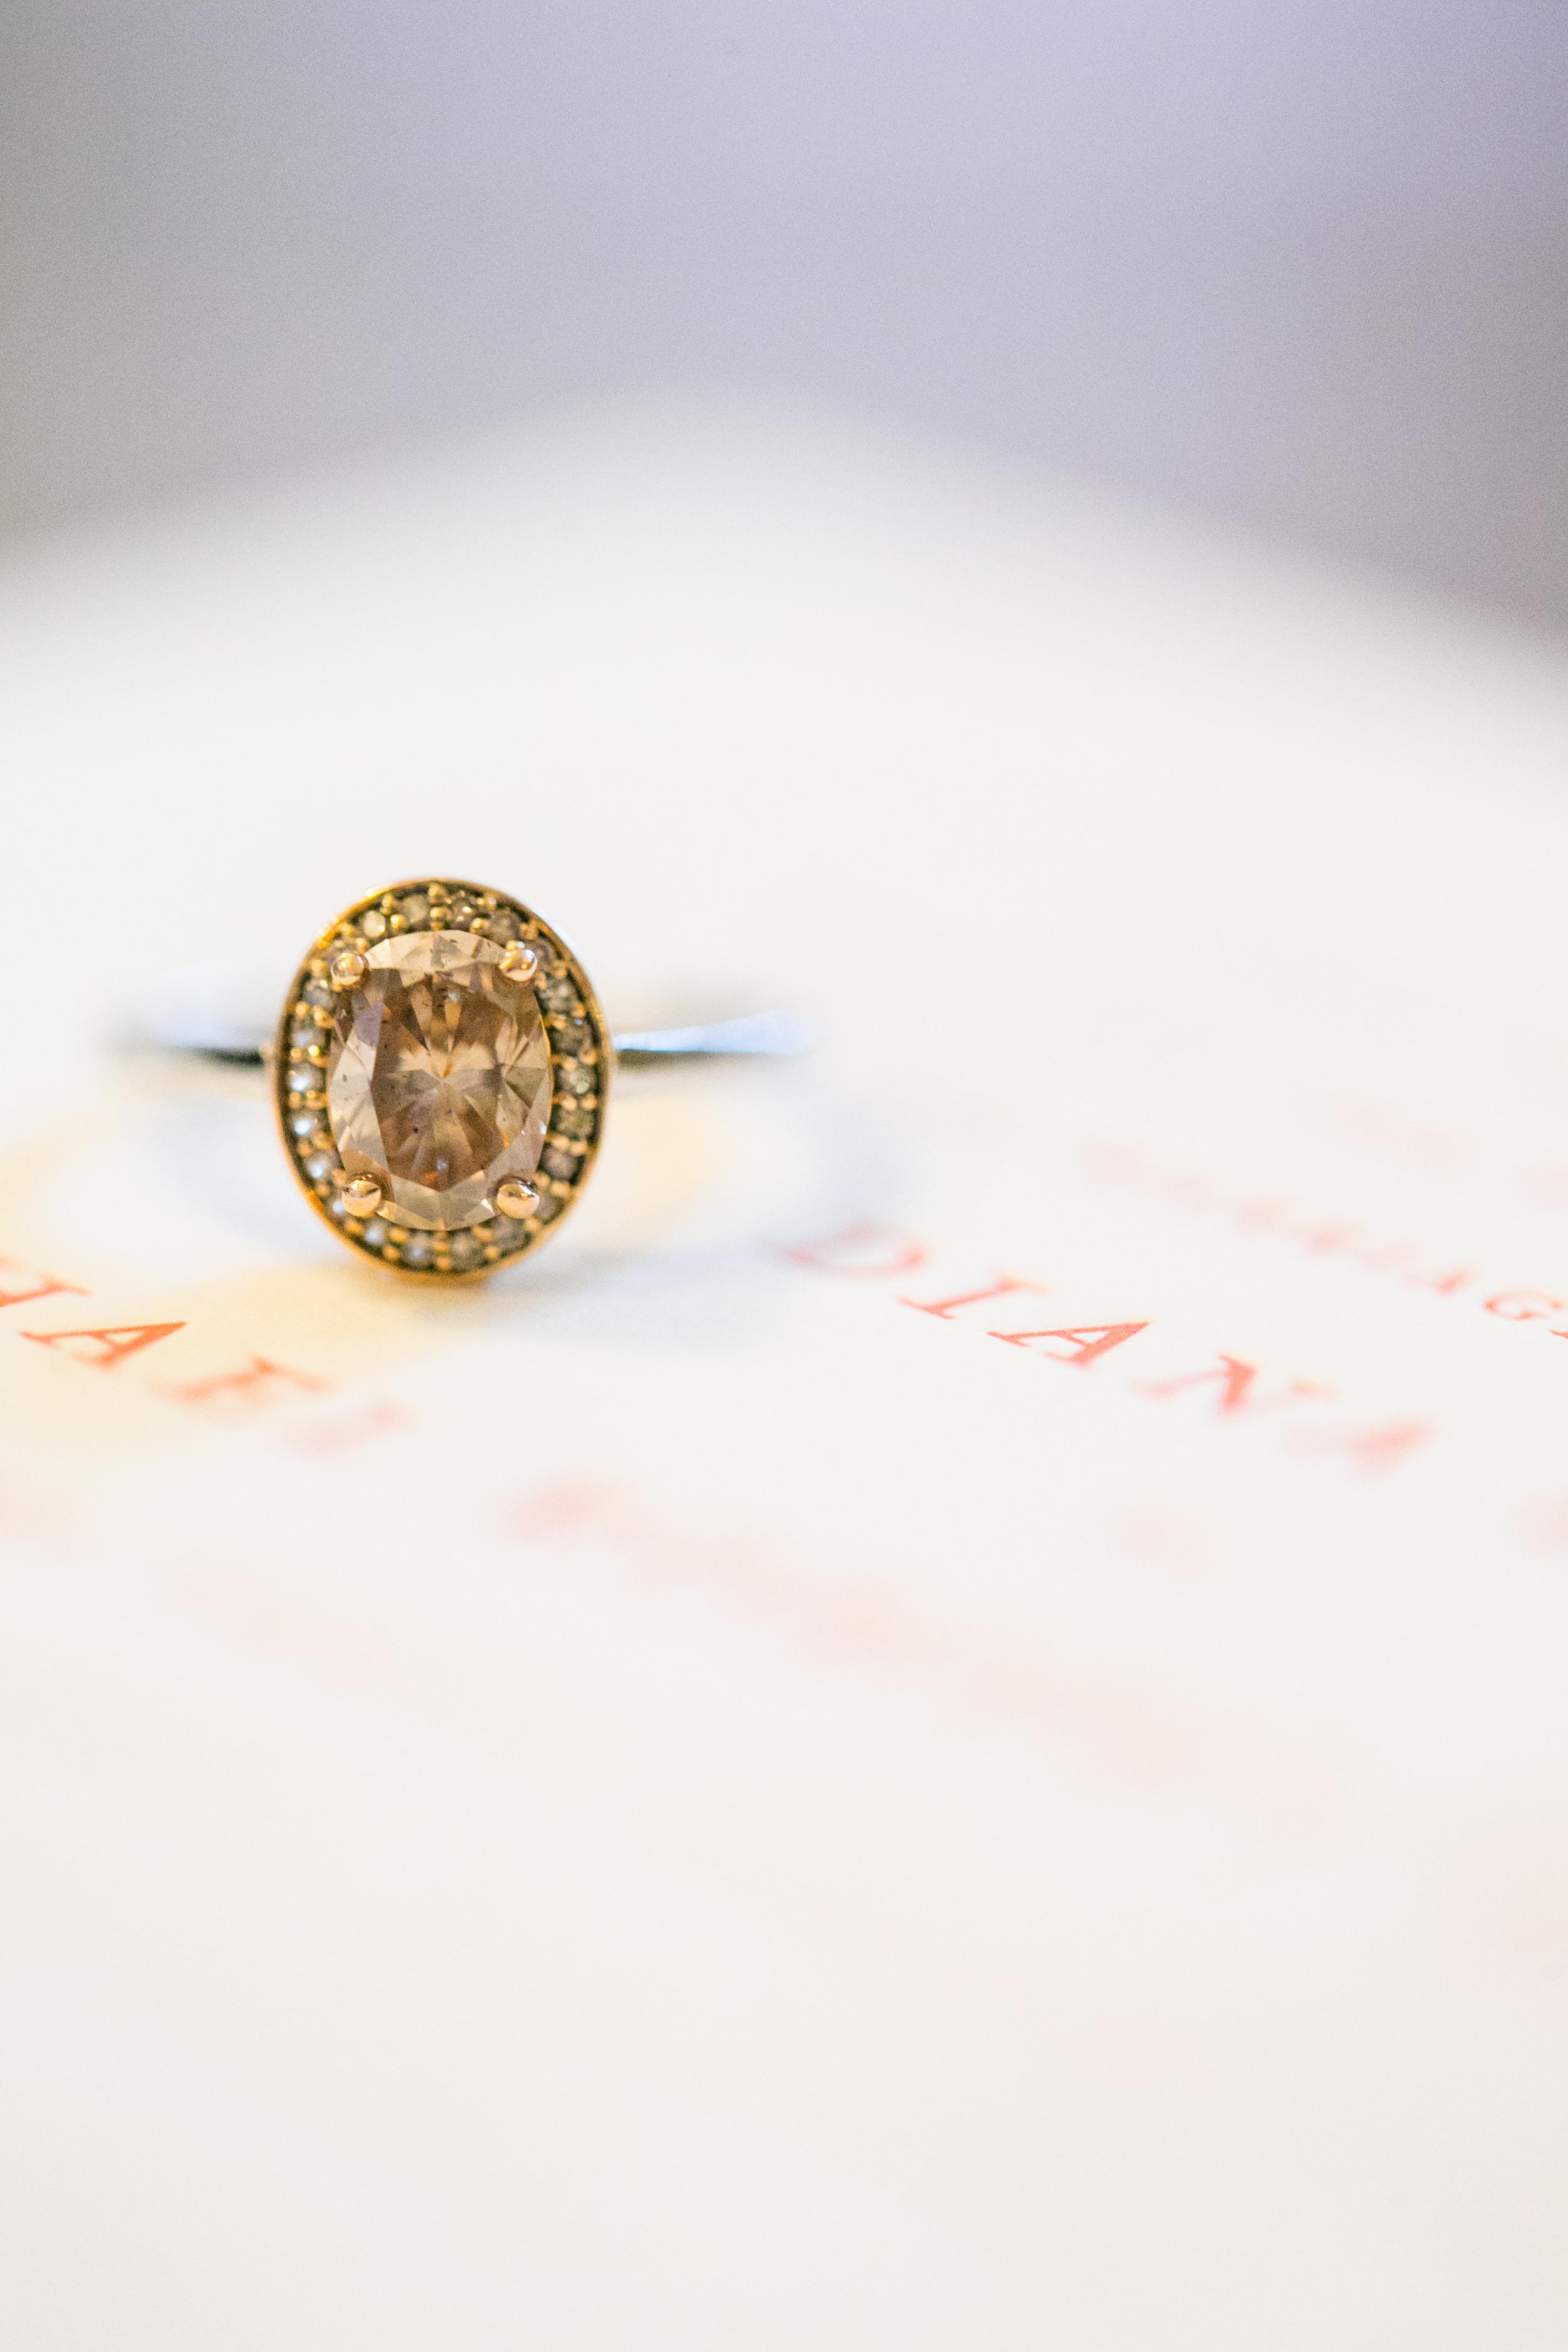 NYC-Wedding-Planner-Andrea-Freeman-Events-Leob-Boathouse-Central-Park-4.jpg